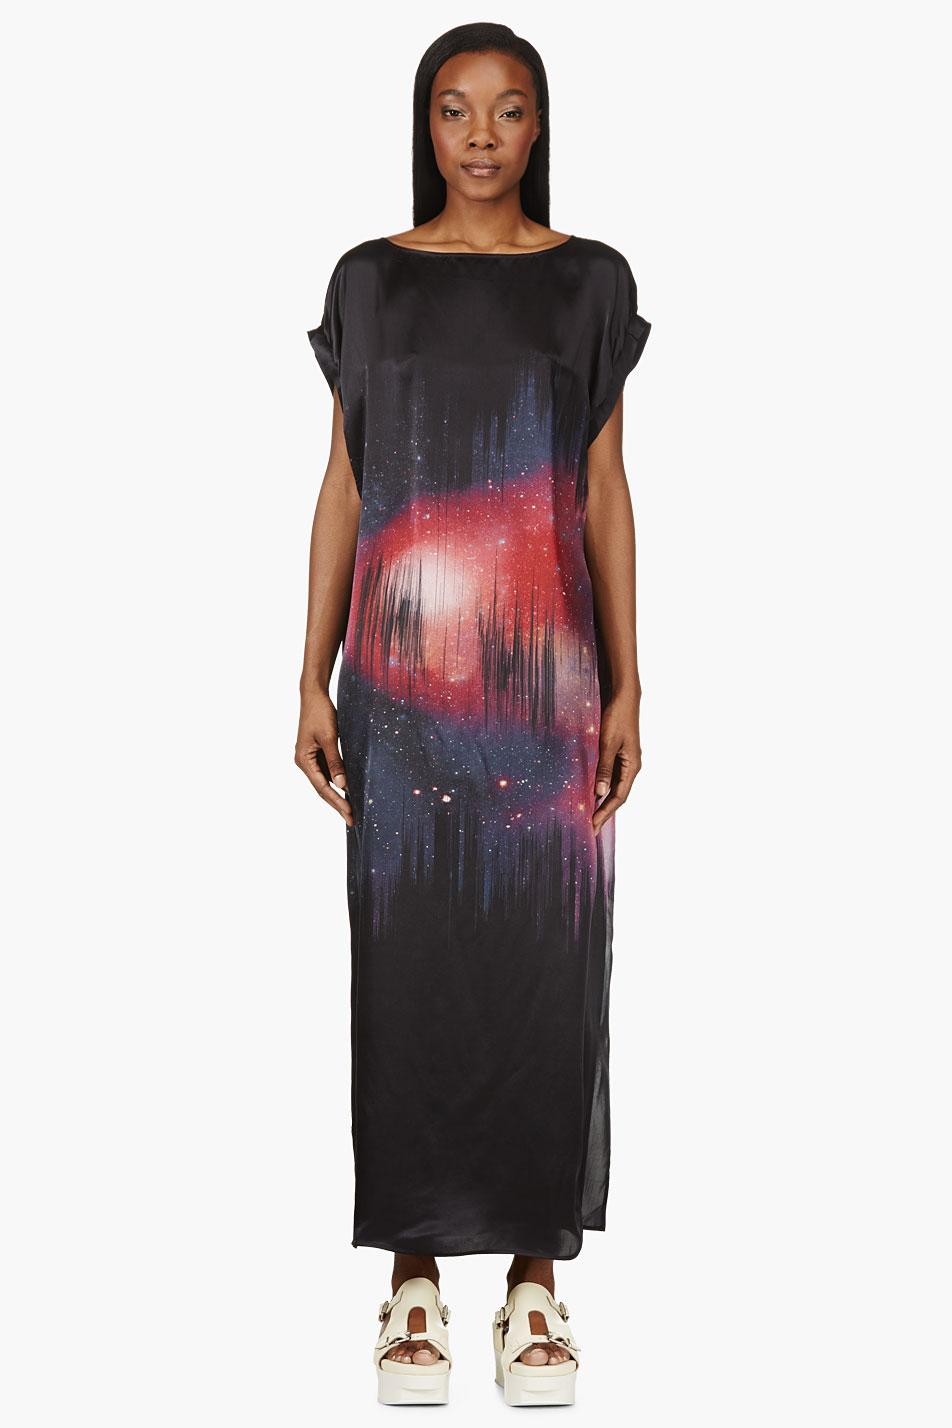 Avelon black and pink silk cosmic glint dress